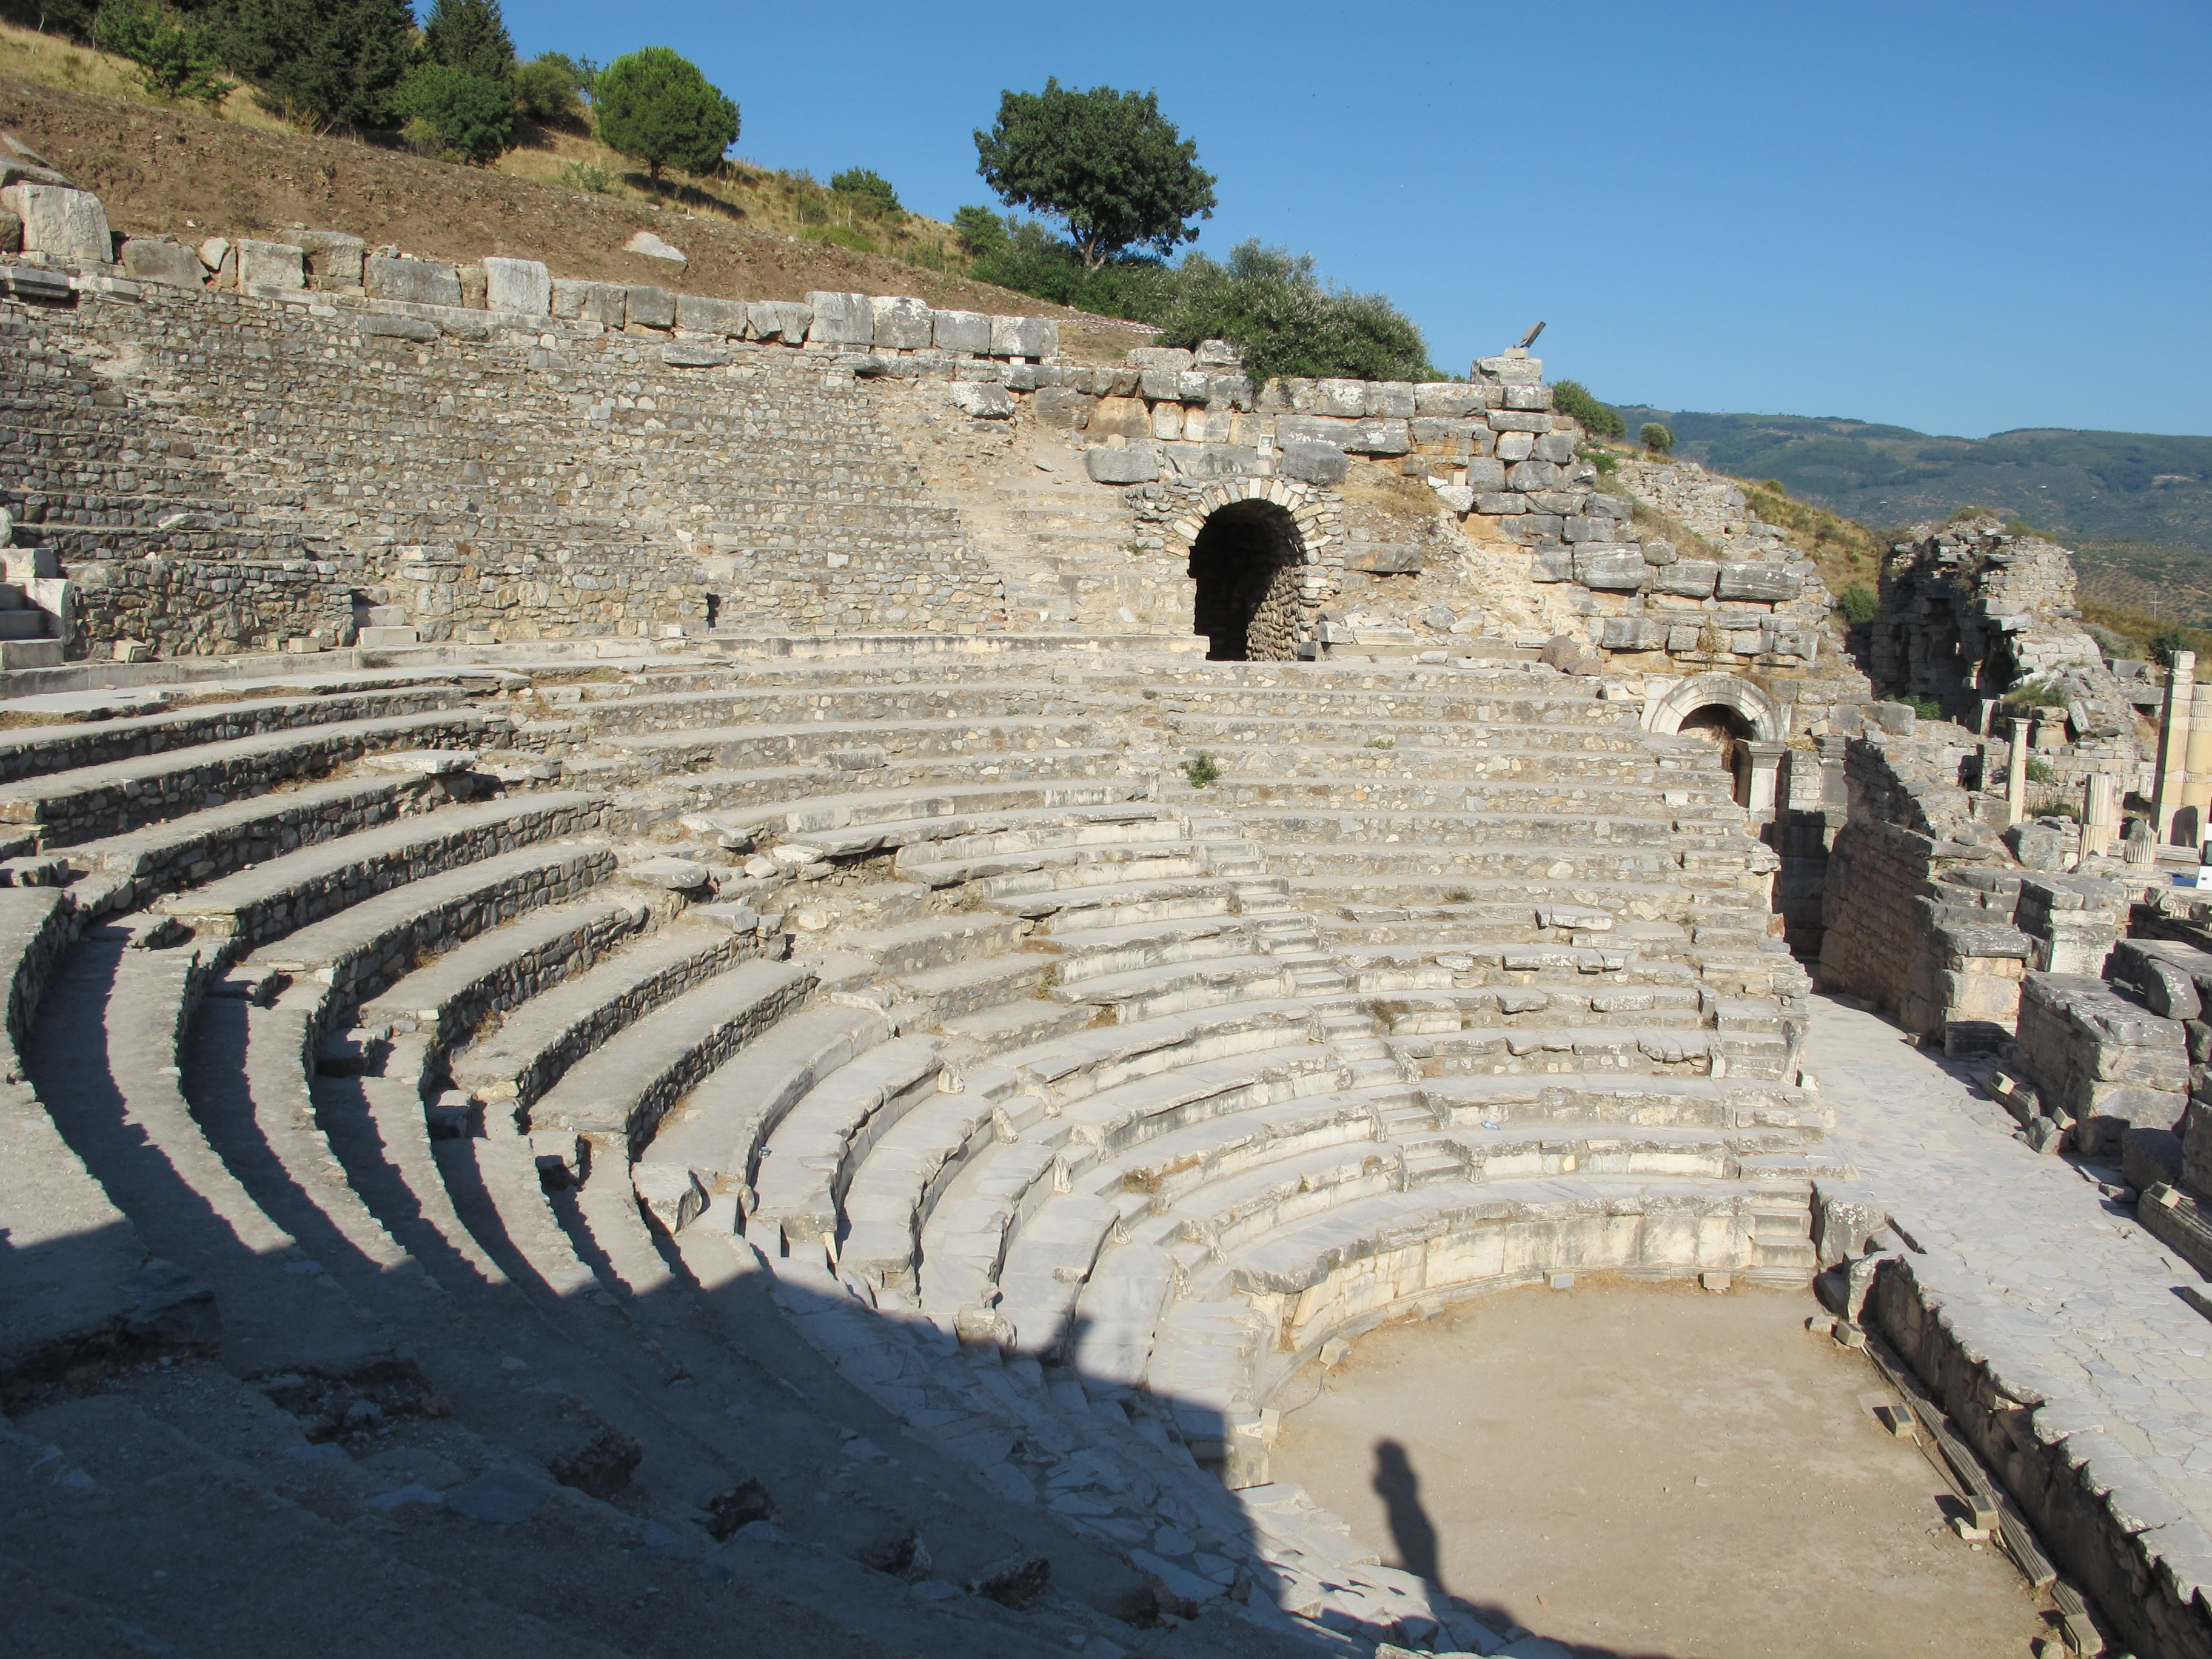 File:Efeso, odeon 04.JPG - Wikimedia Commons